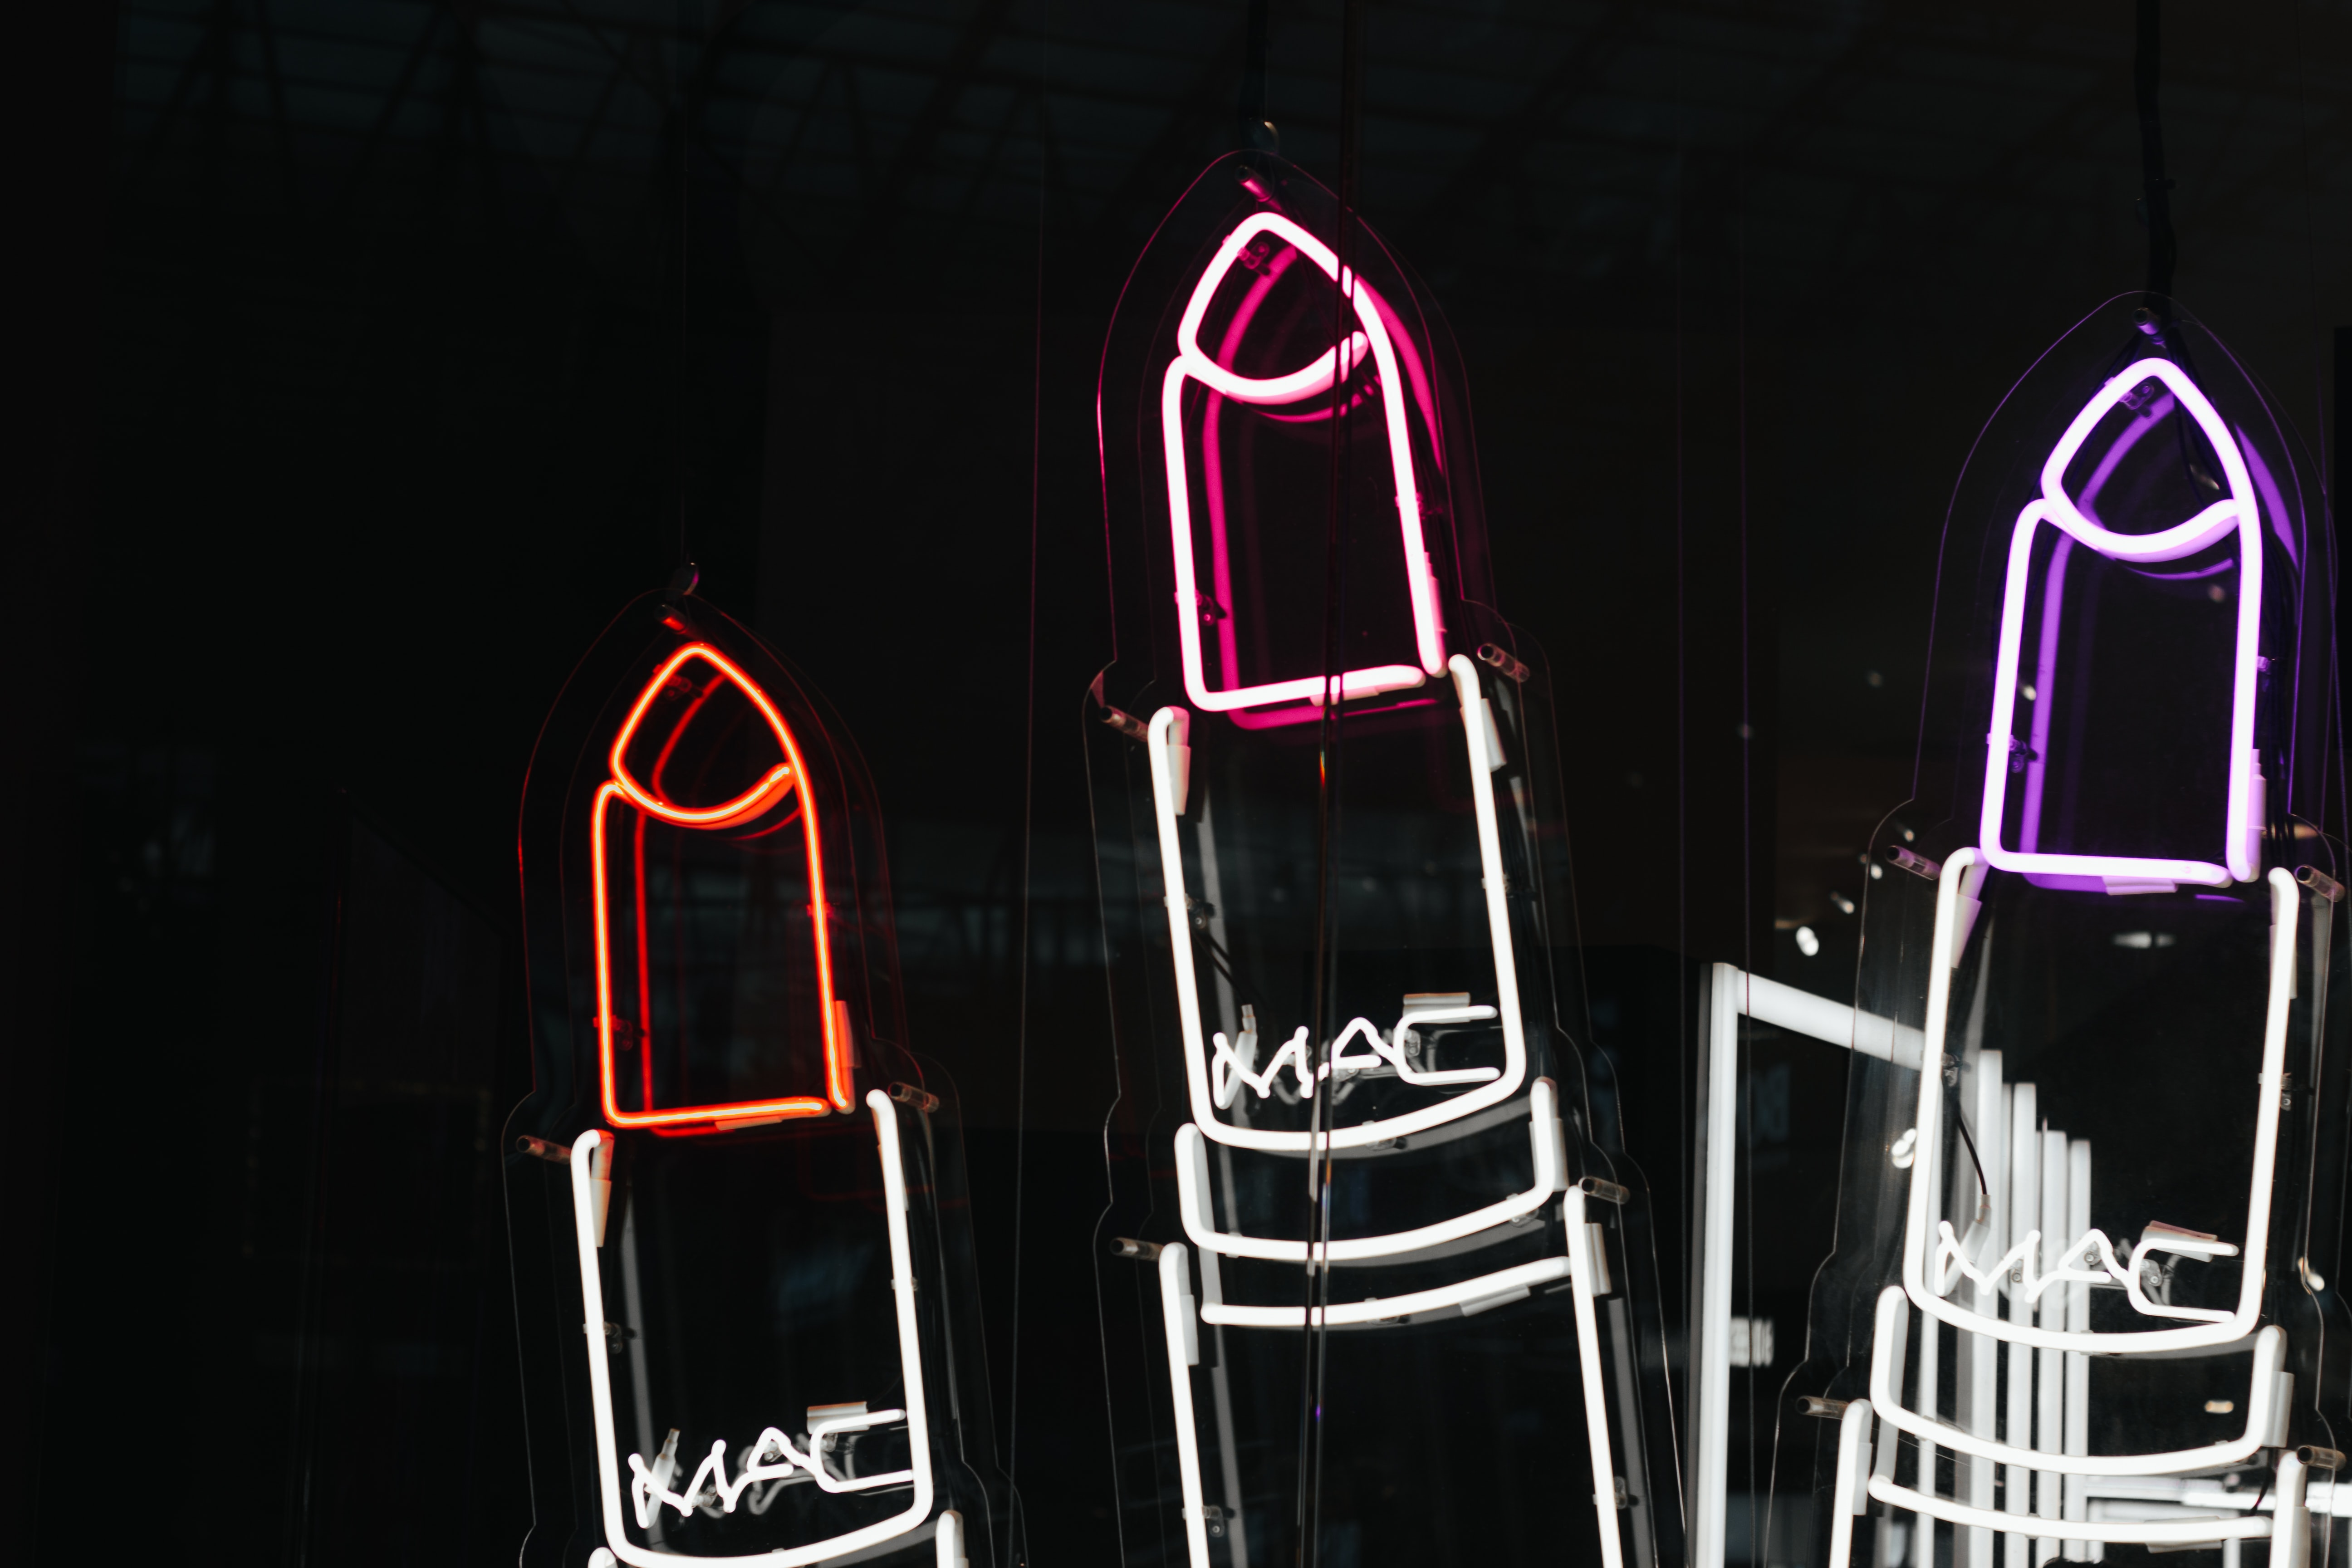 three white MAC lipstick artwork